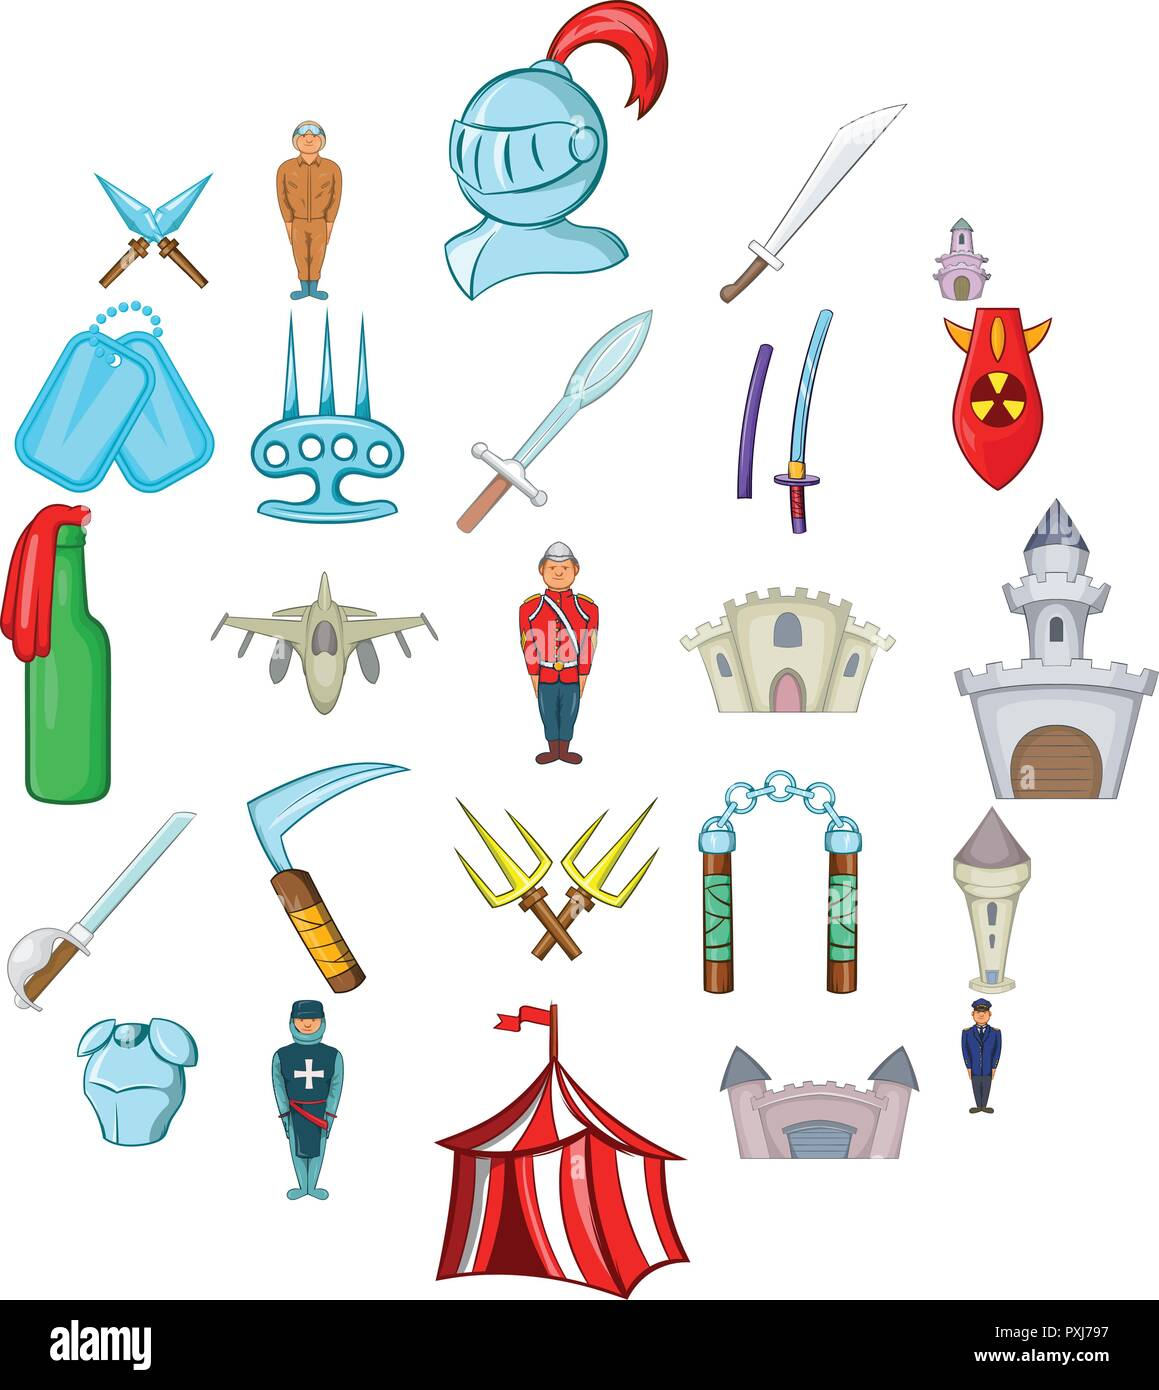 Belligerent icons set, cartoon style - Stock Image